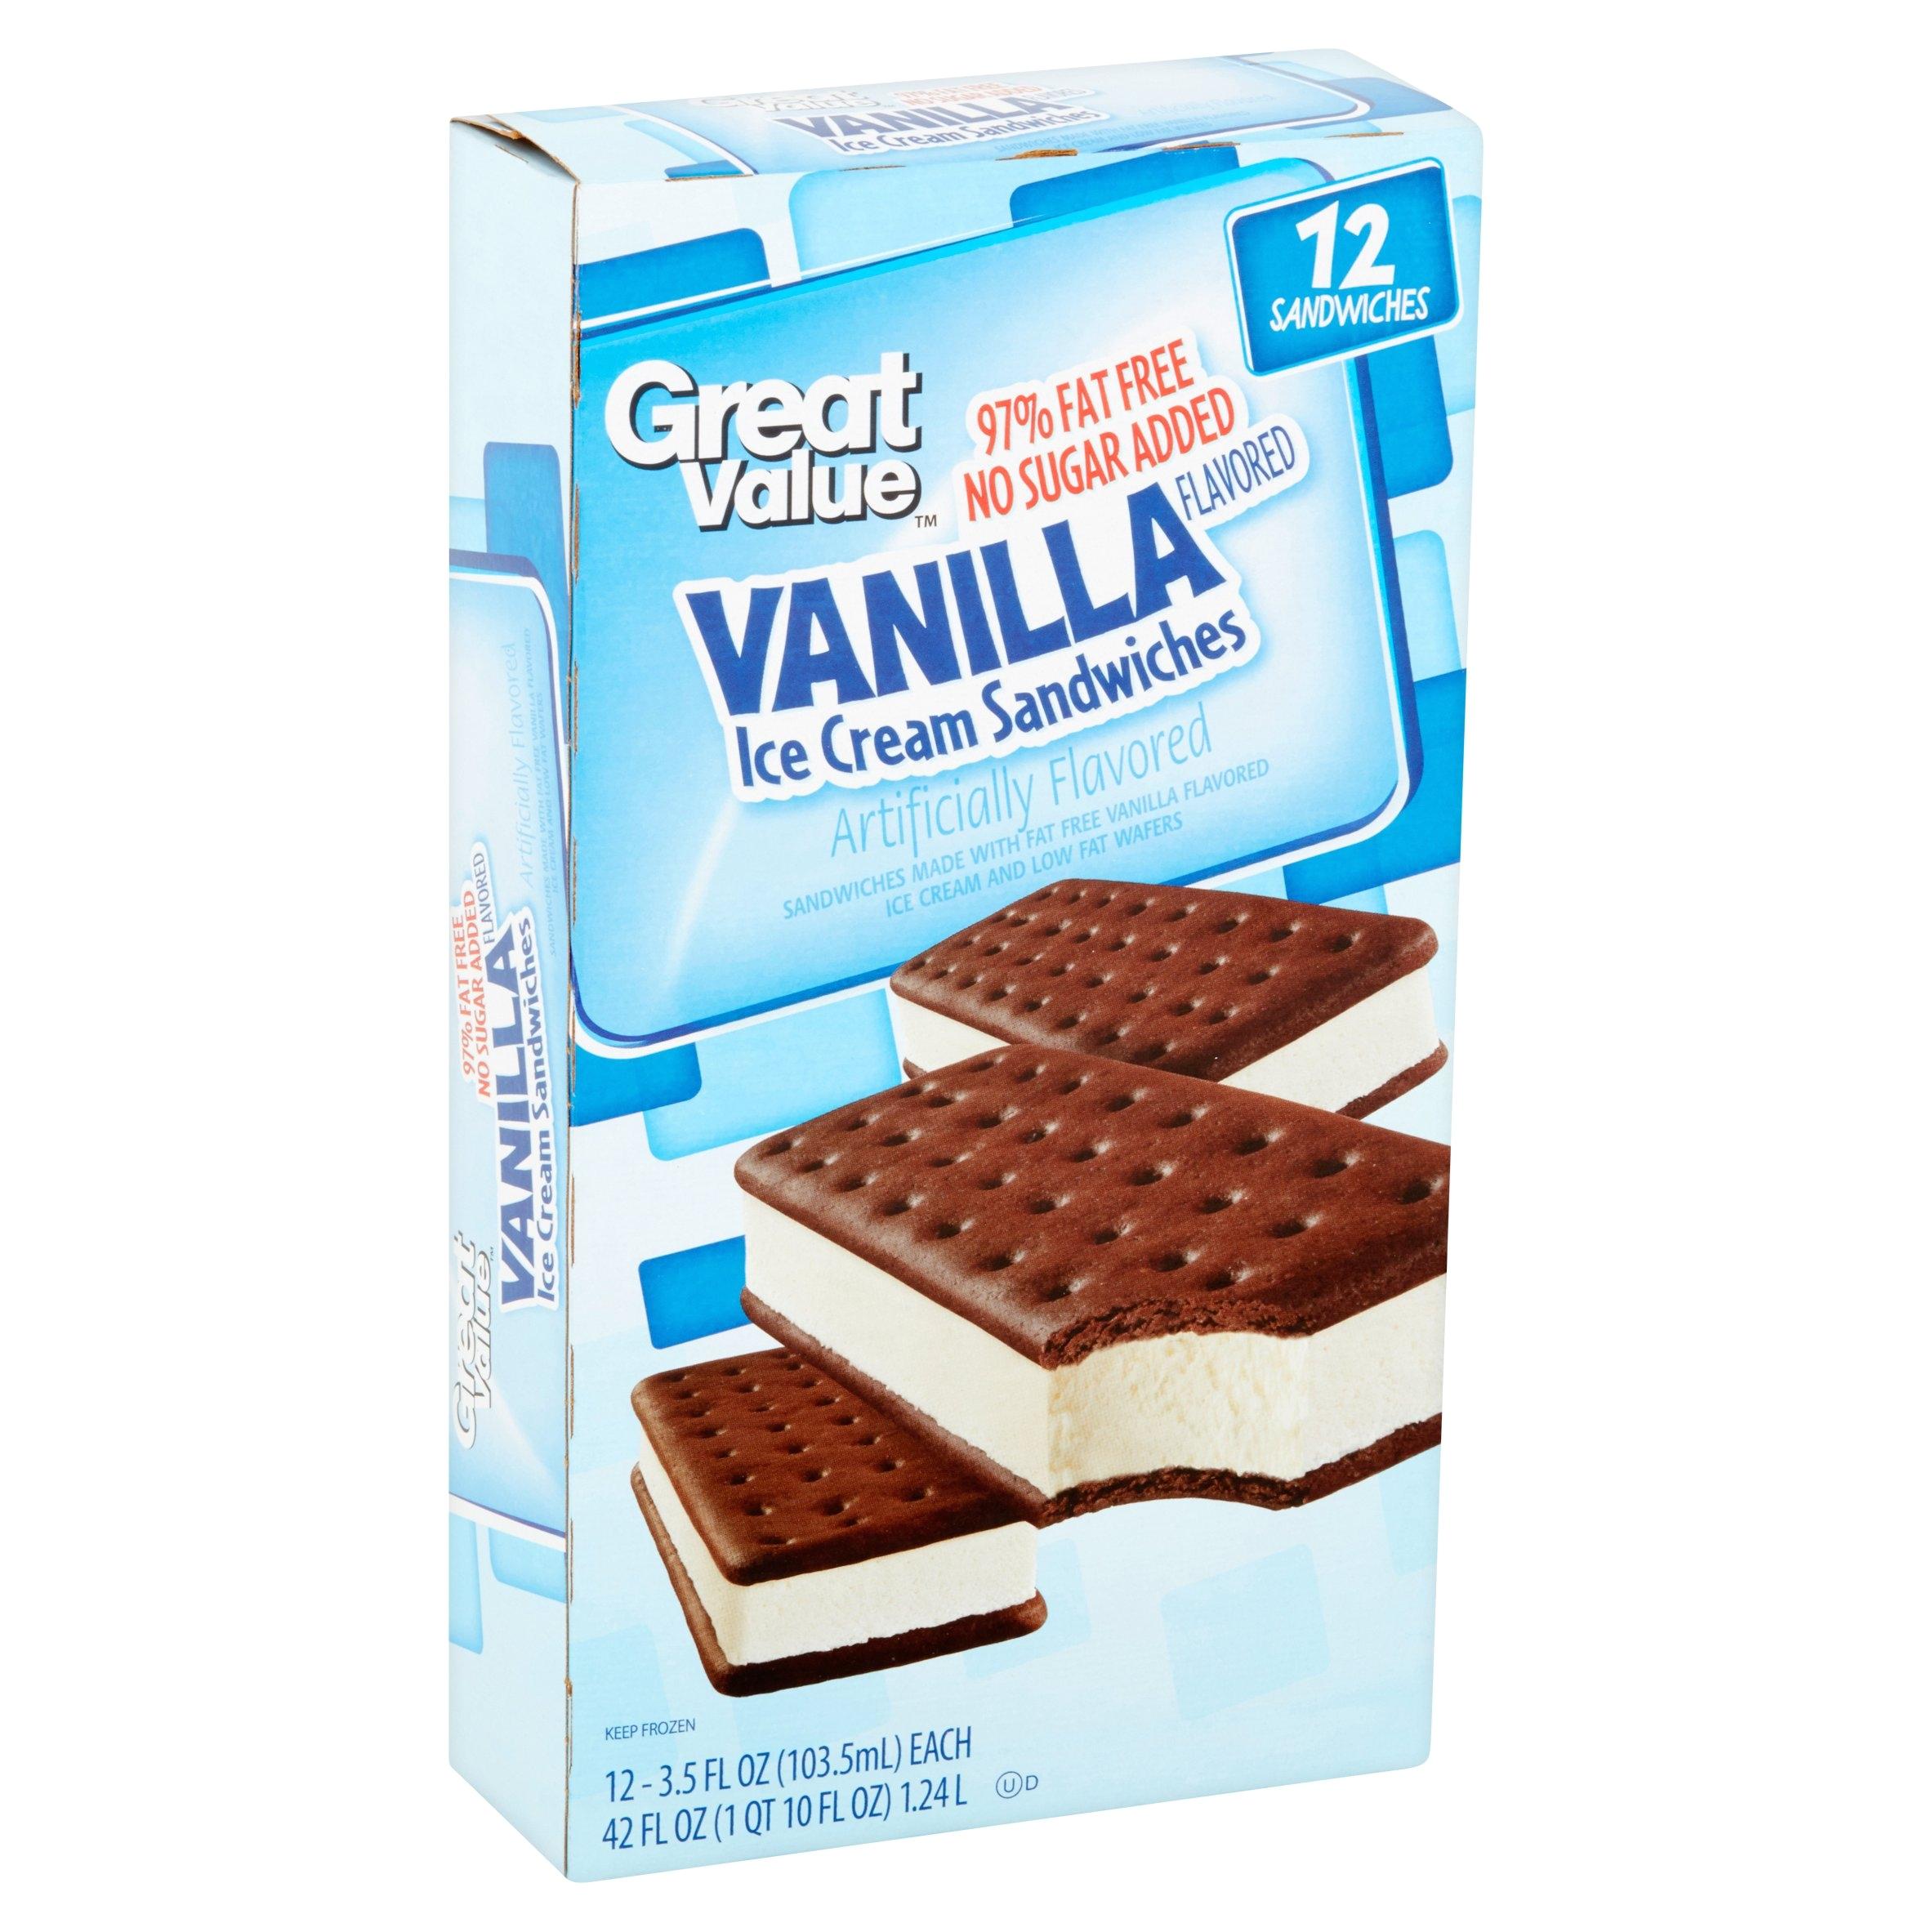 great value vanilla flavored ice cream sandwiches low fat 42 oz 12 count walmart com